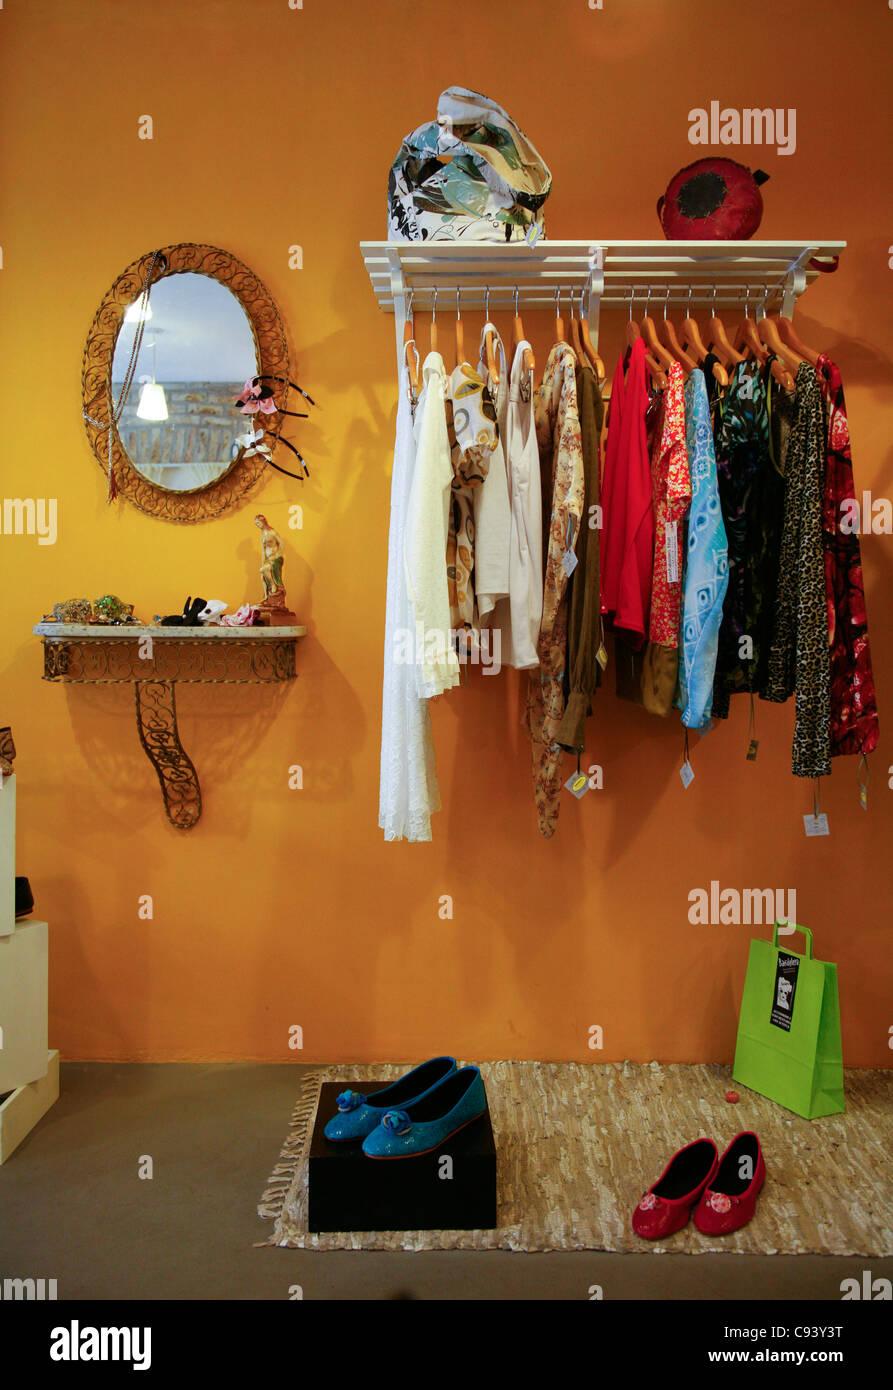 Uruguay clothing stores